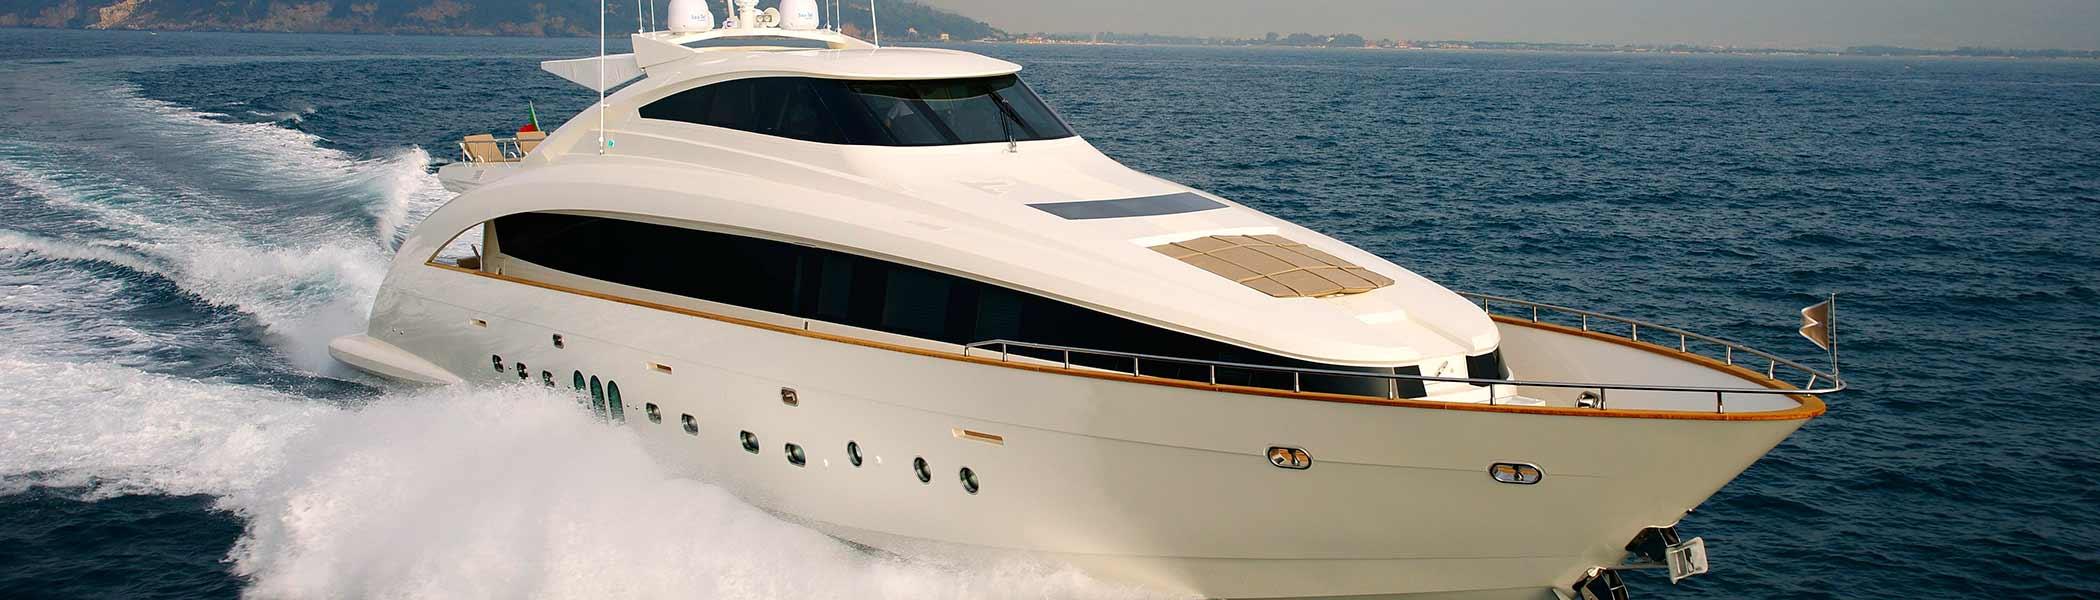 Amer Yachts - Amer 116 a116-11